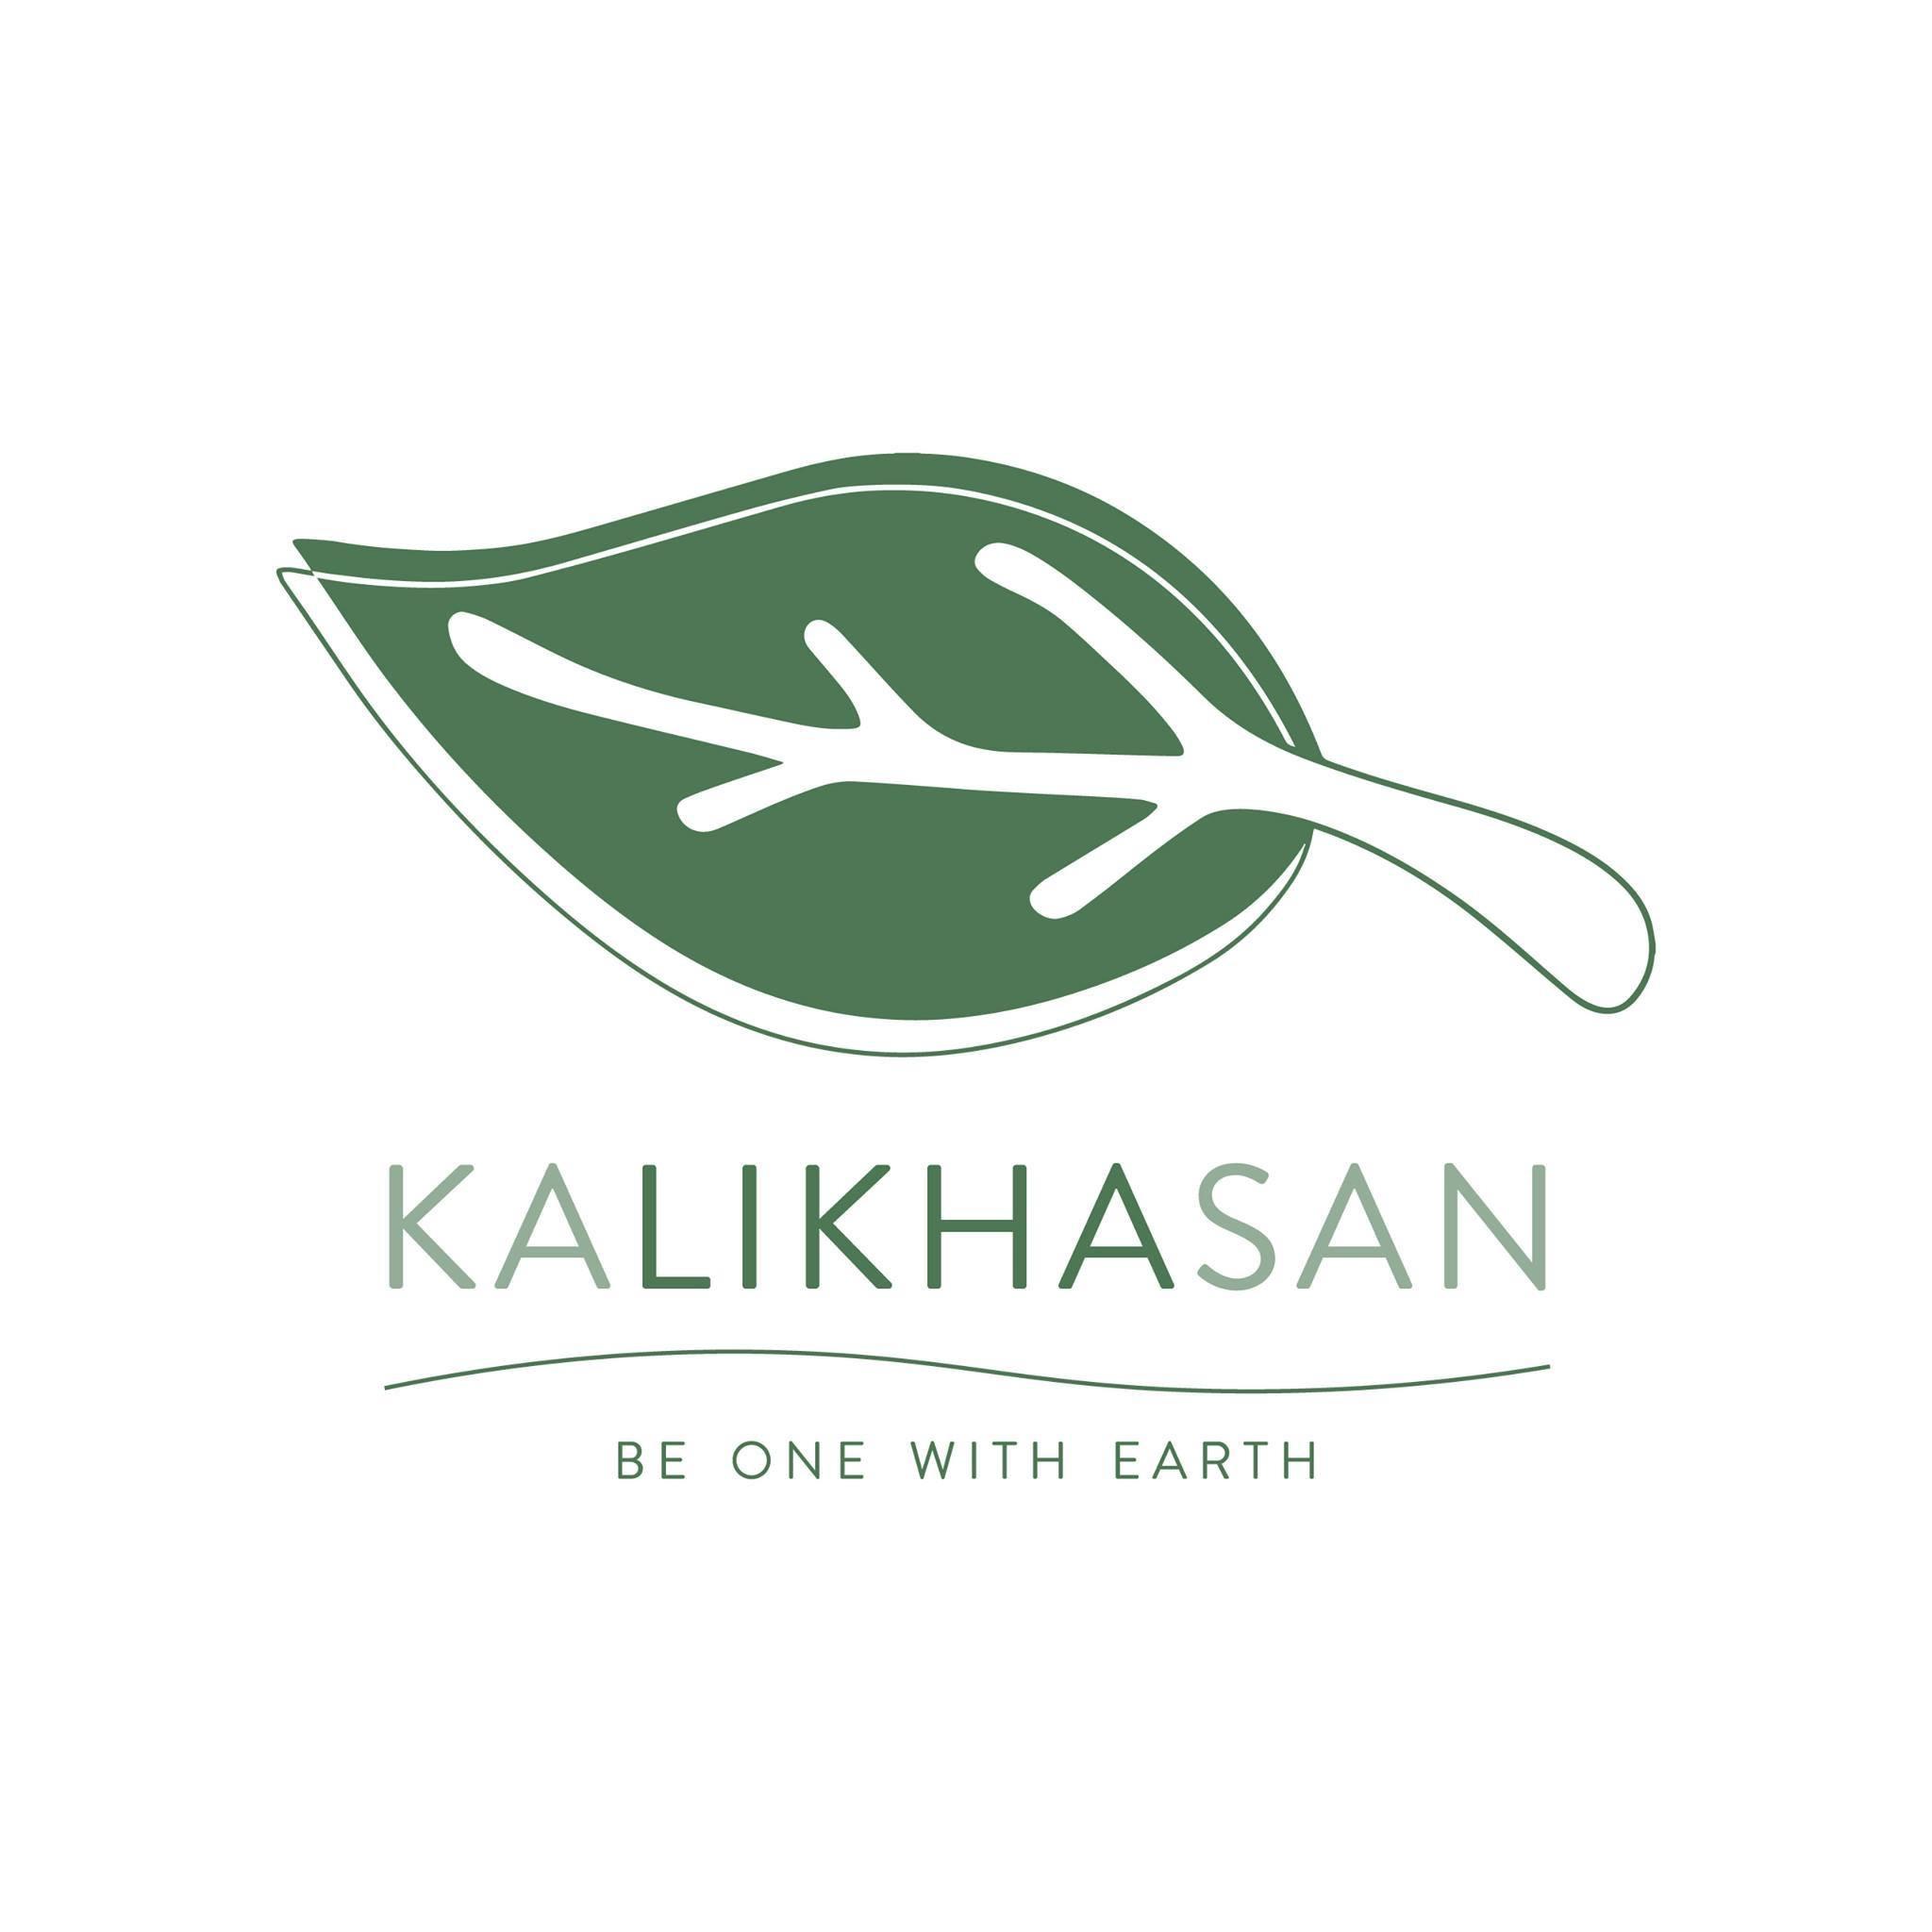 Kalikhasan Eco-Friendly Solutions